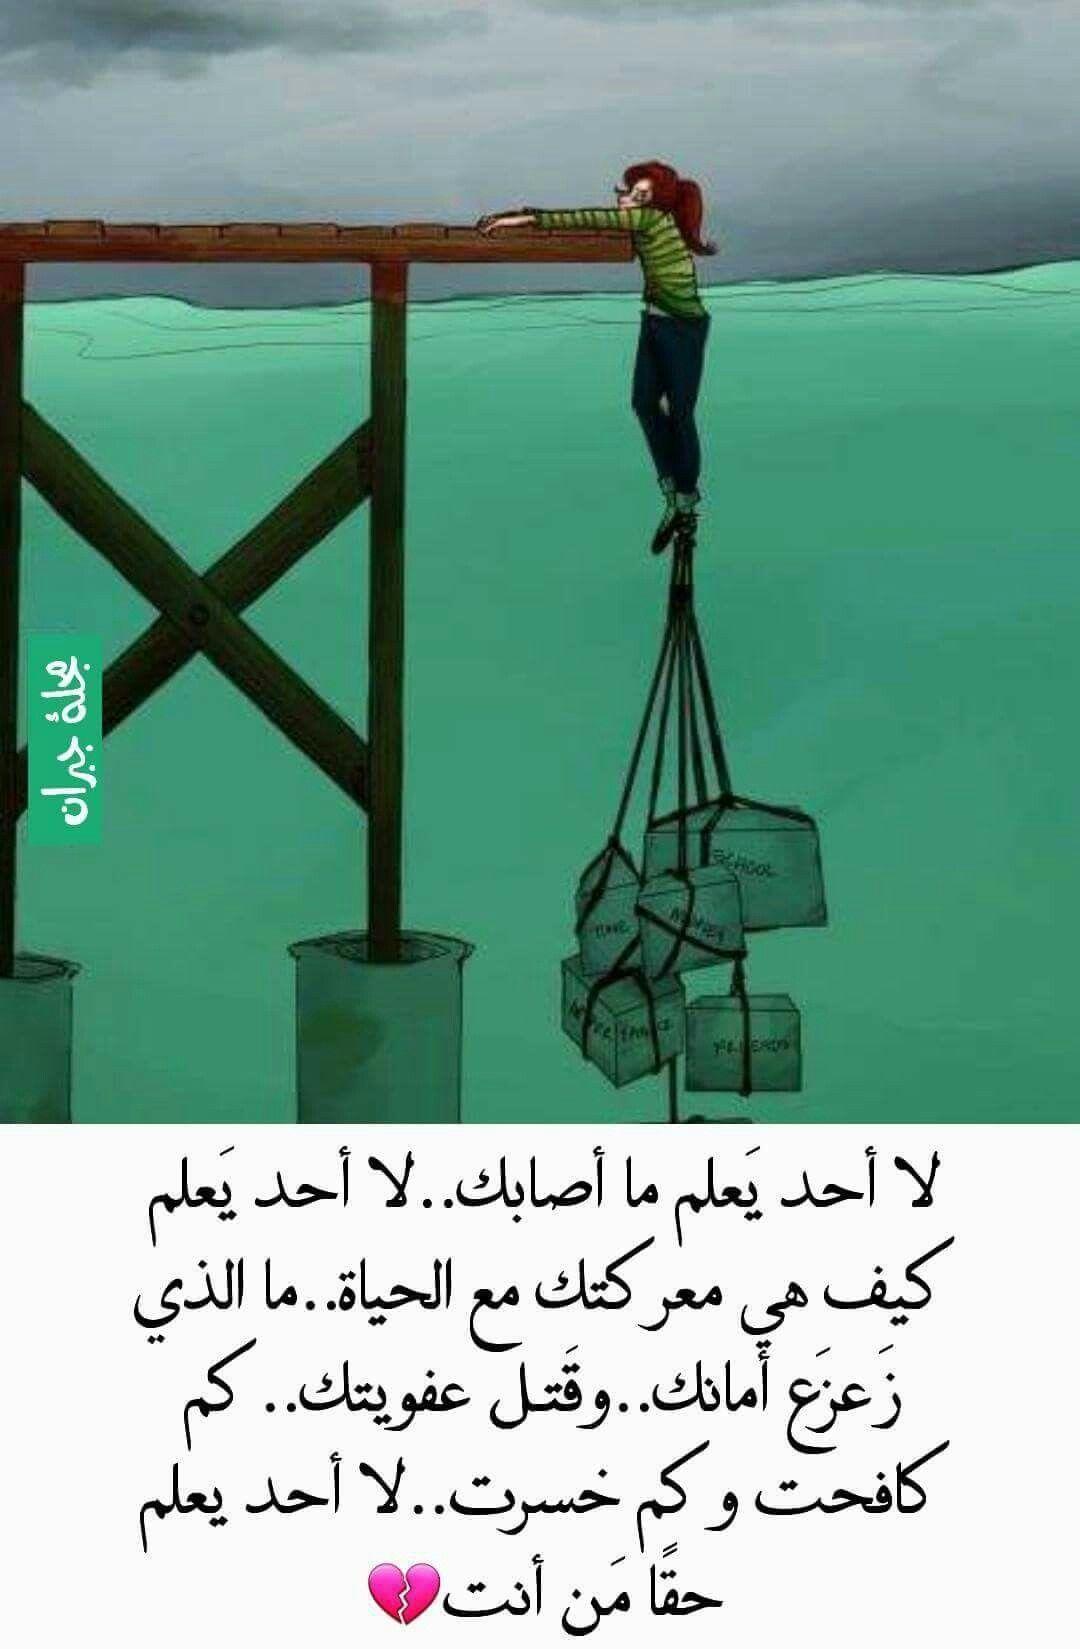 لااحد يعلم حقا من انت Arabic Quotes Arabic Love Quotes Beautiful Quotes